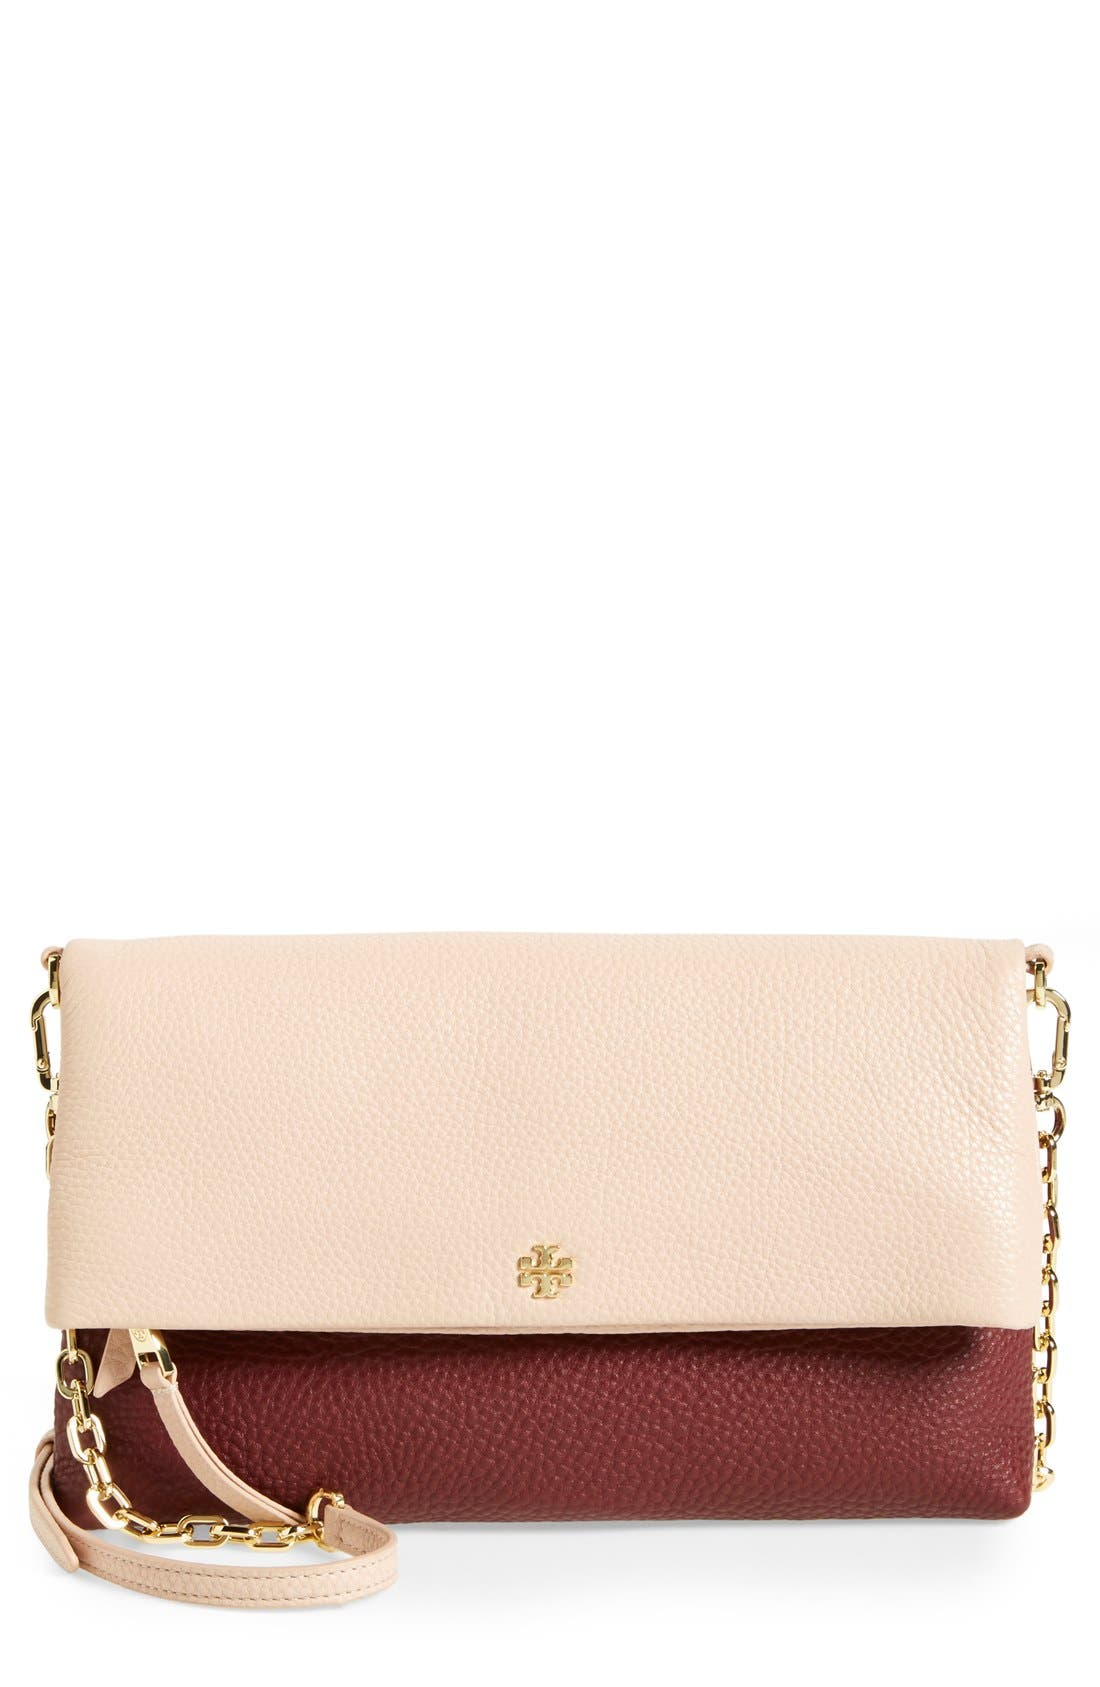 Main Image - Tory Burch Foldover Crossbody Bag